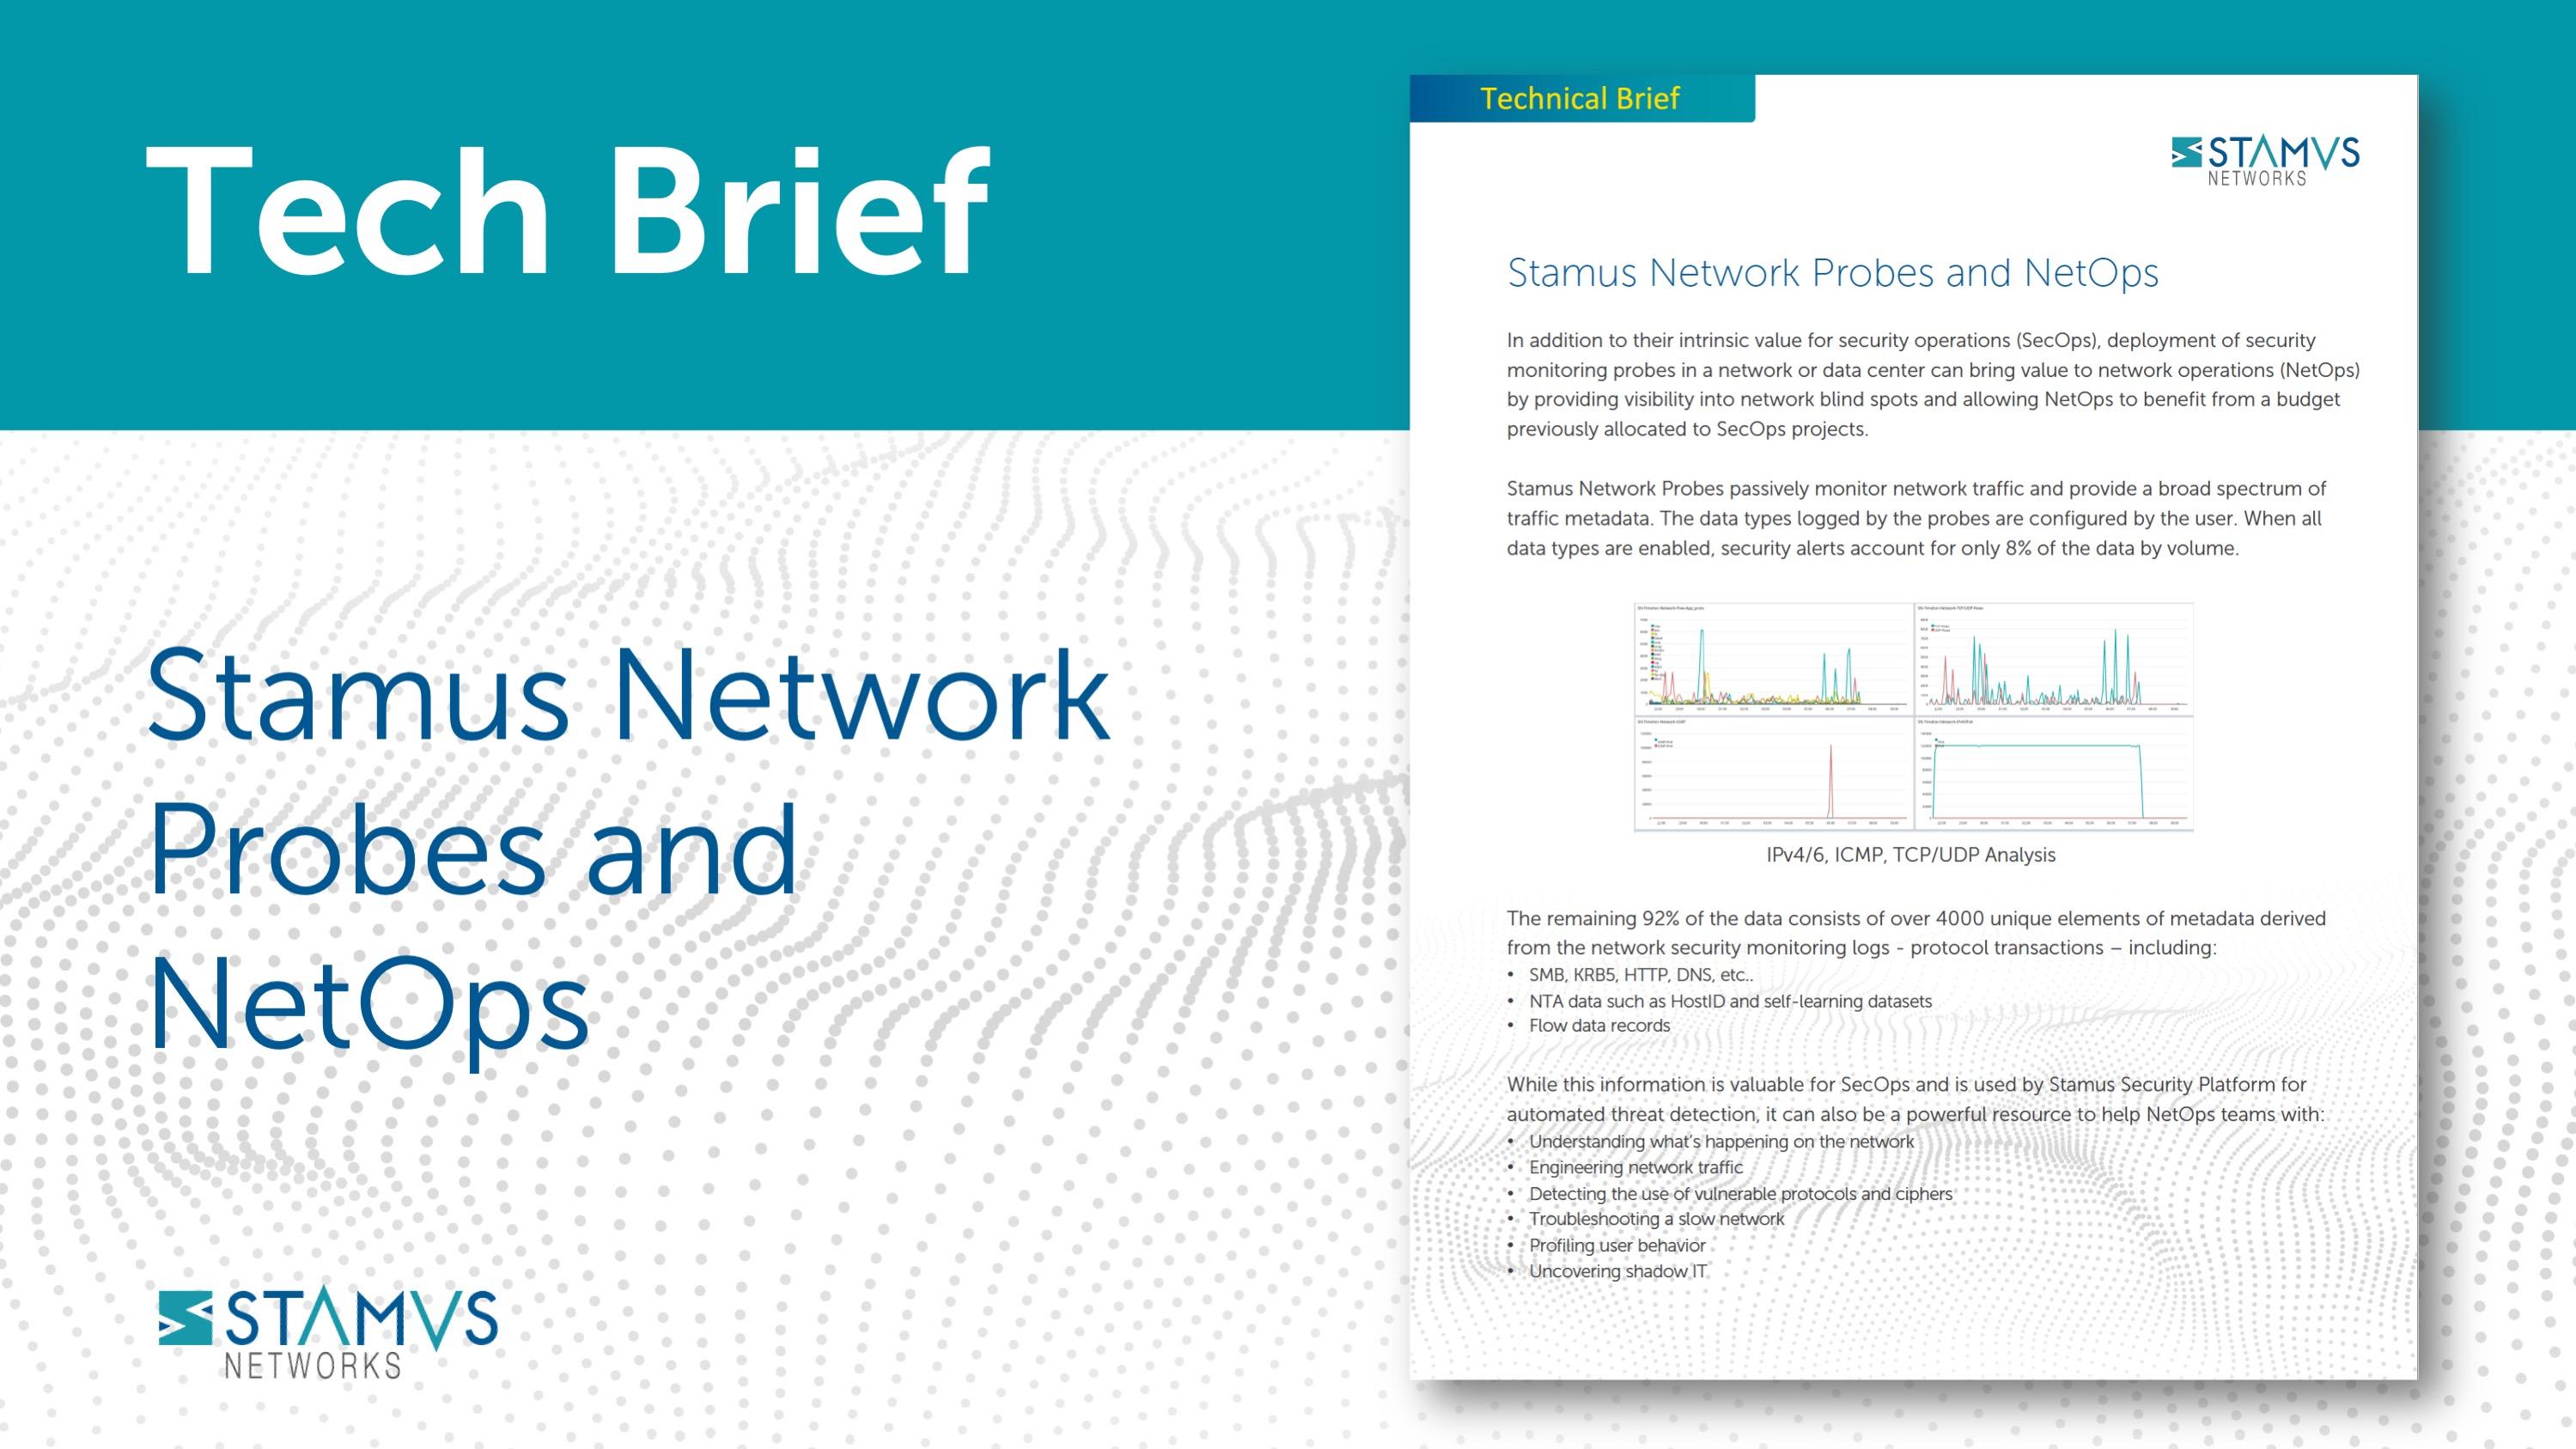 Stamus Networks Tech Brief - NetOps